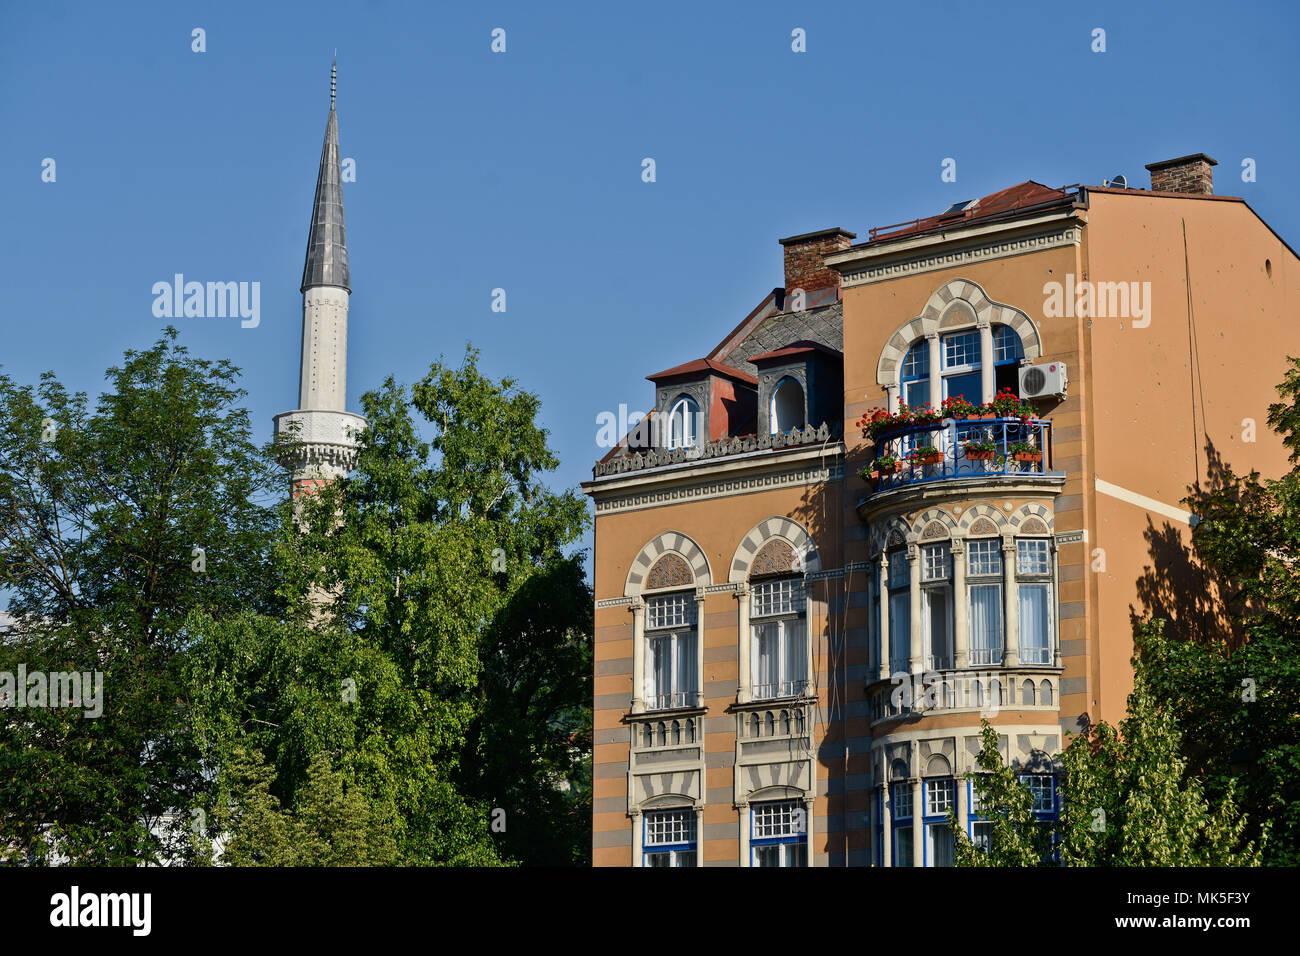 Islamic architecture, Sarajevo, Bosnia - Stock Image